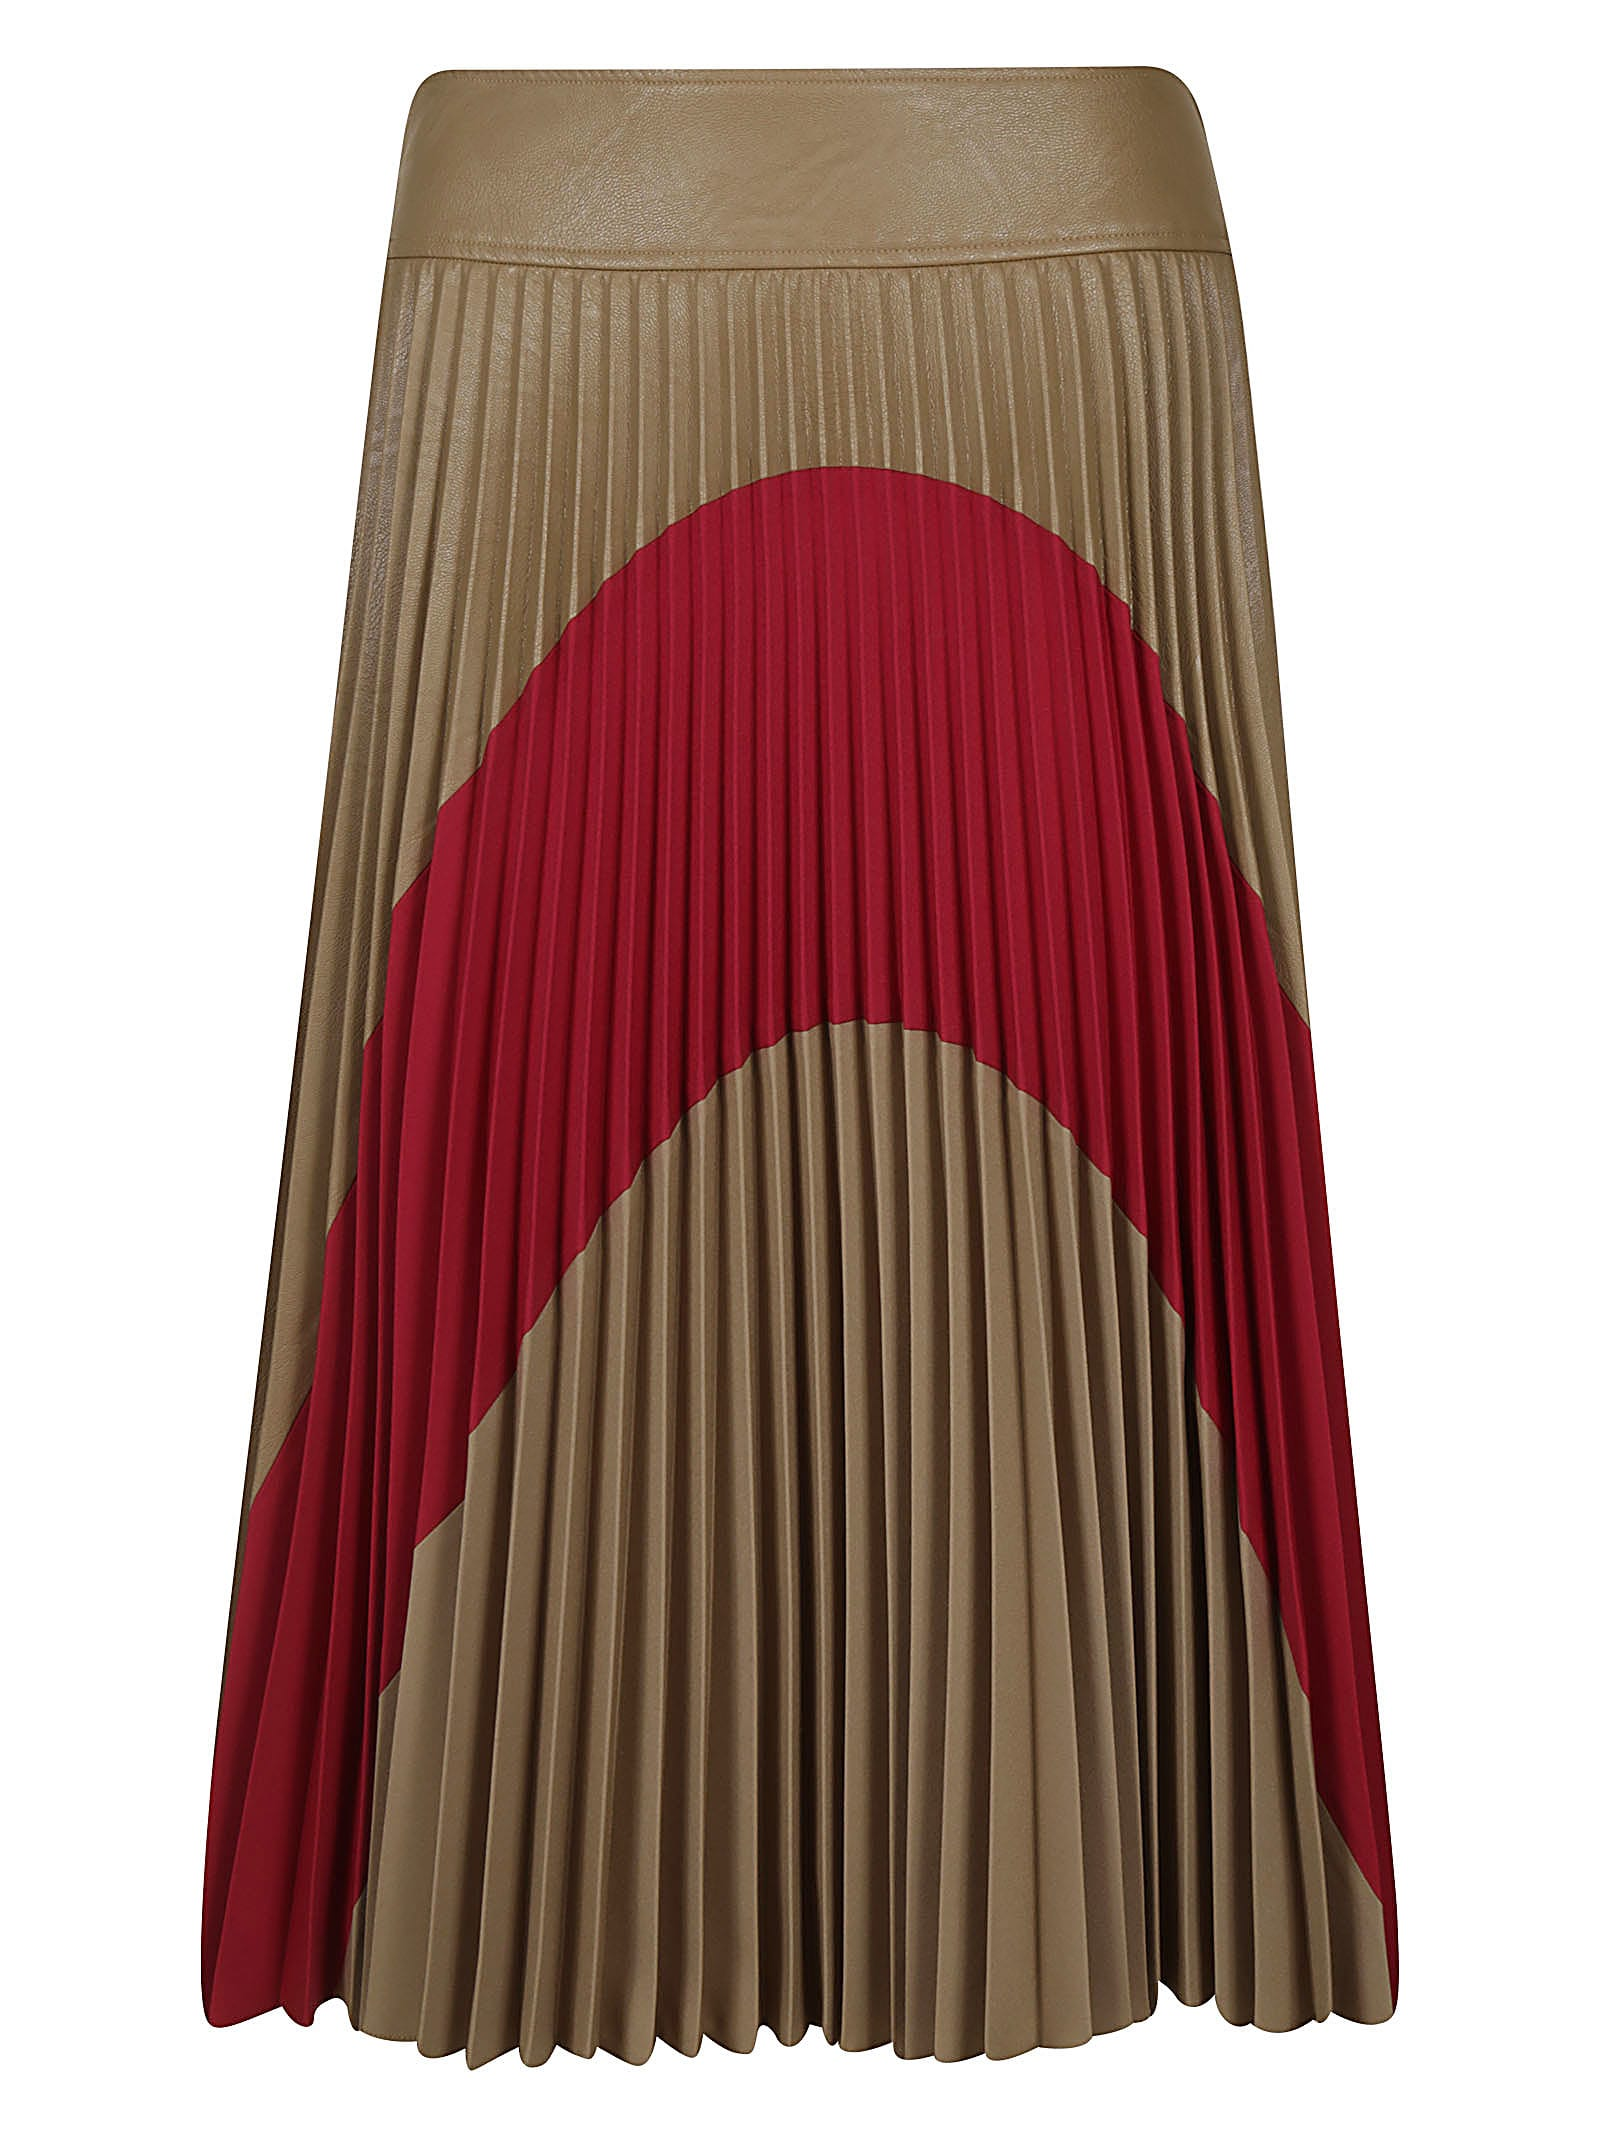 Stella McCartney Pleated Flared Skirt